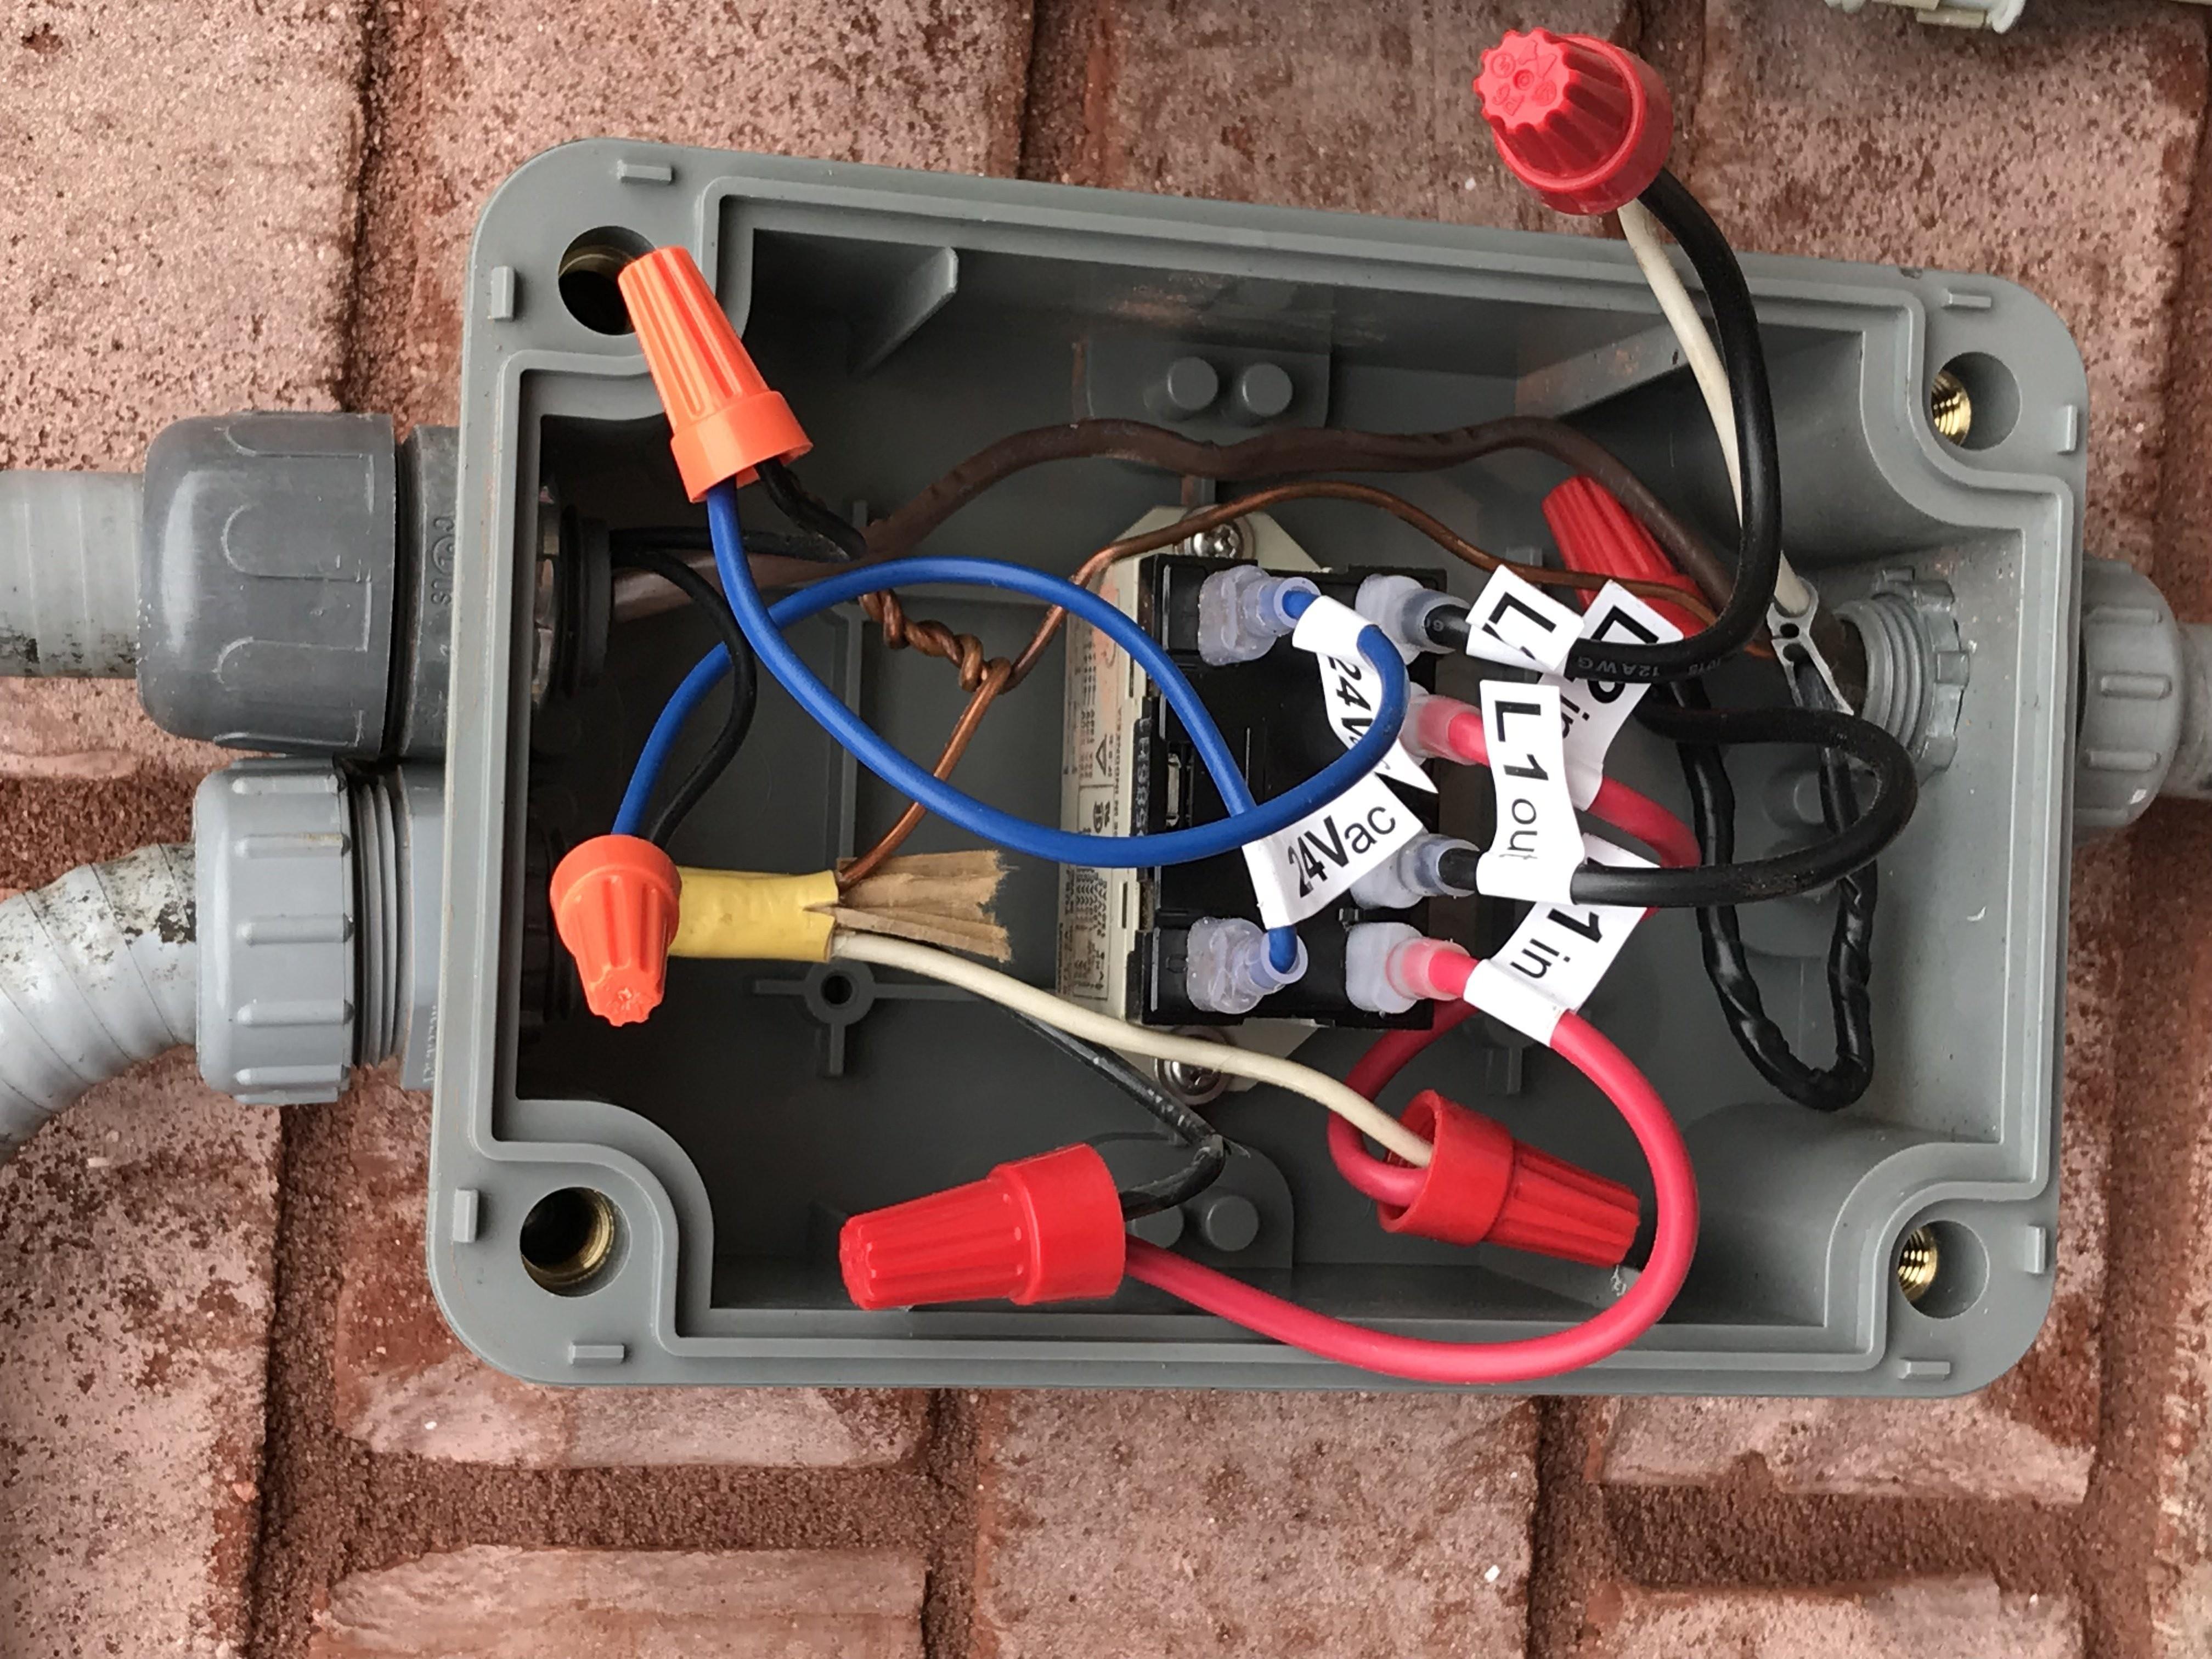 Orbit Pump Start Relay Instructions I Am attempting to Install An orbits 4 Station Digital Timer Of Orbit Pump Start Relay Instructions